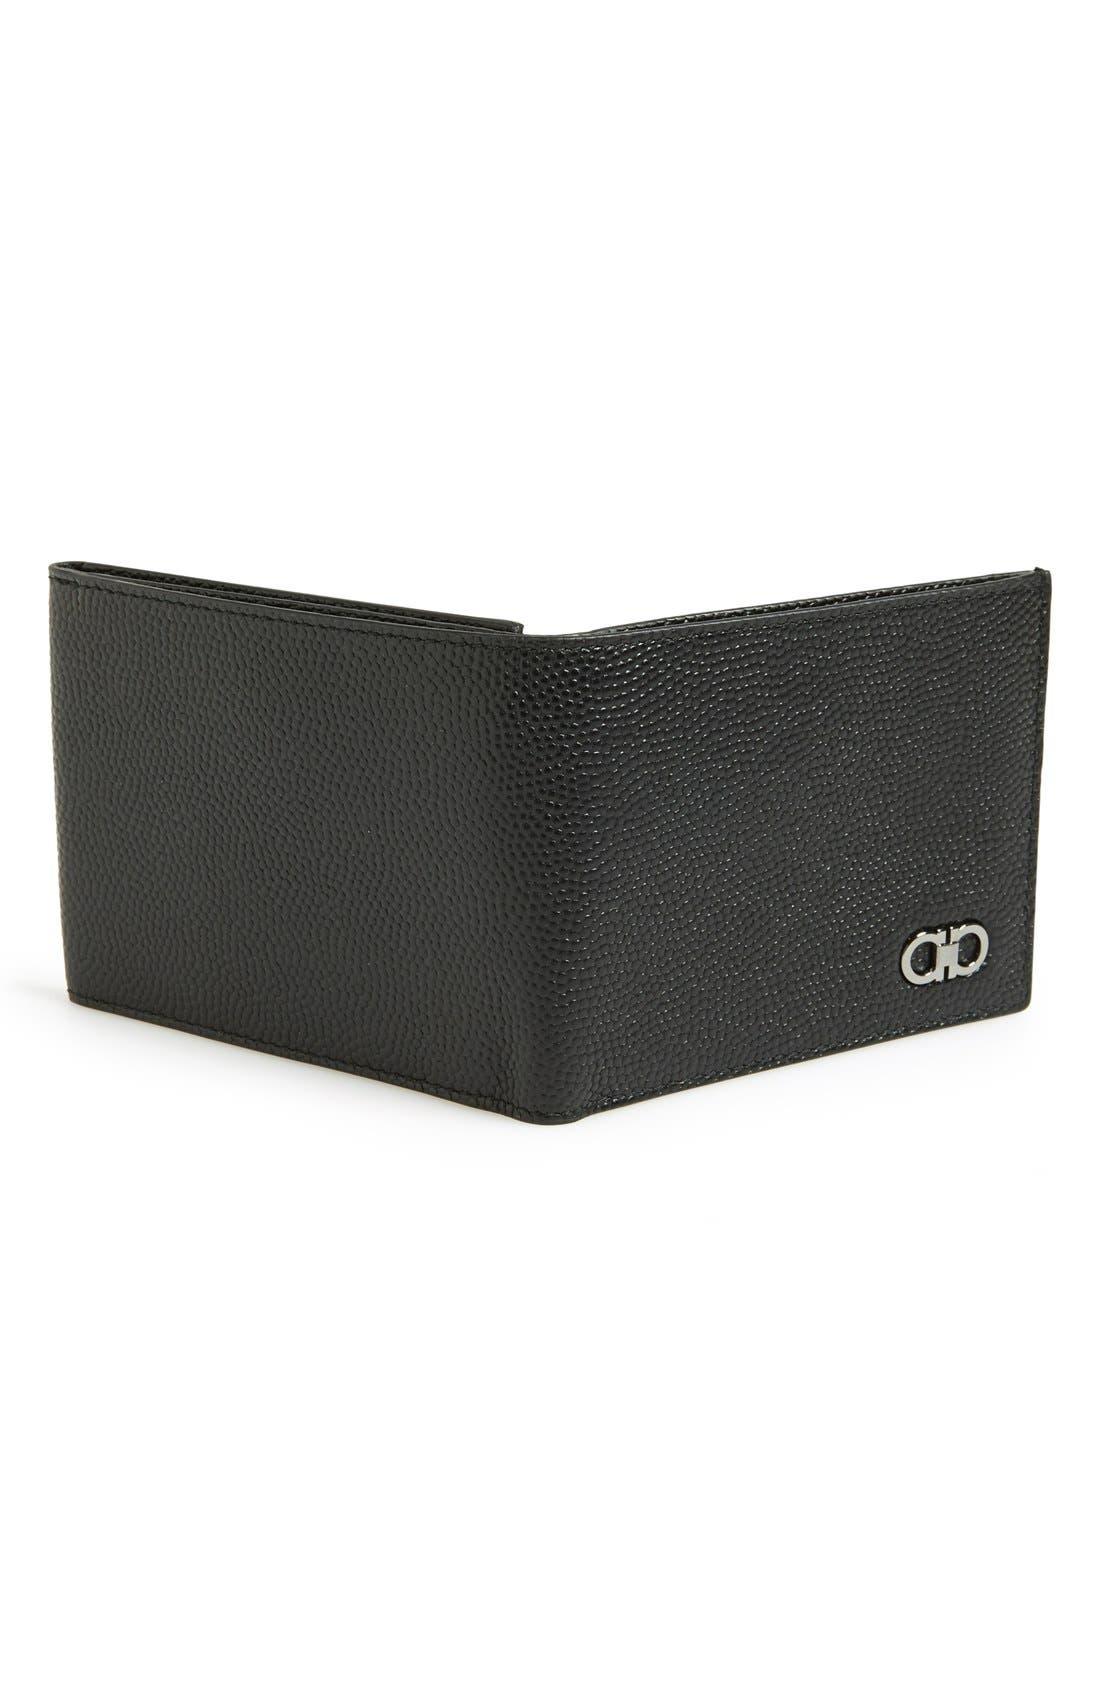 Trifold Wallet,                             Alternate thumbnail 6, color,